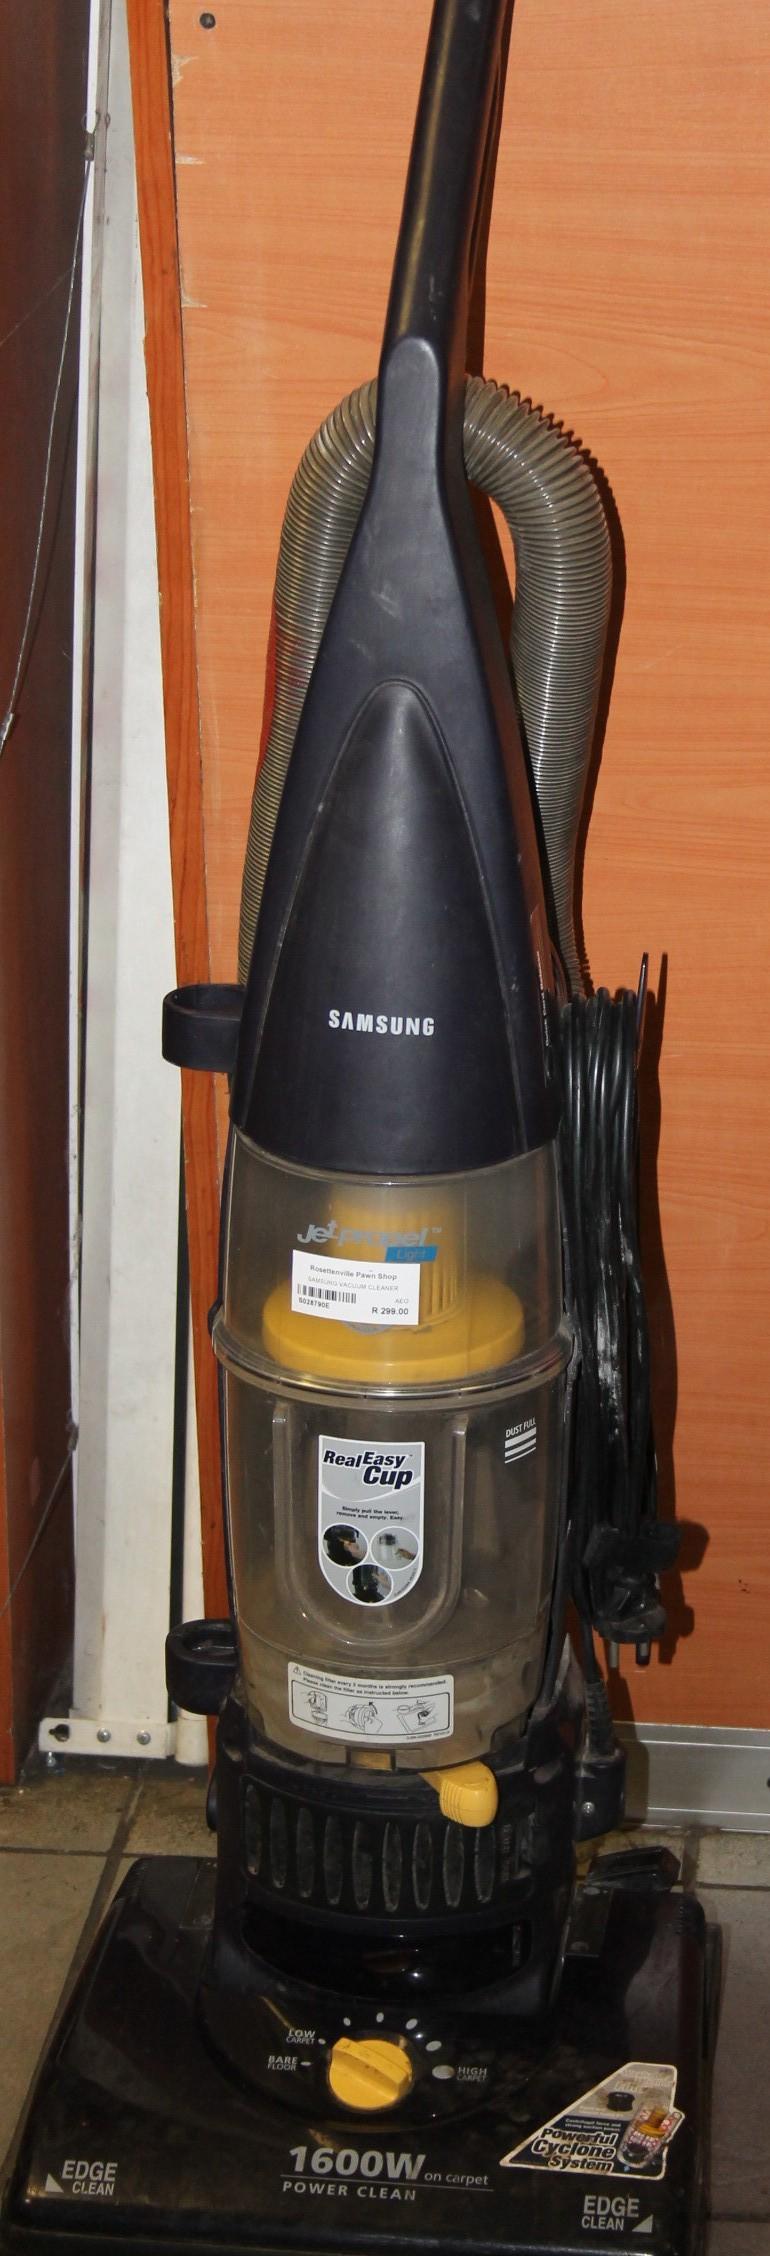 Samsung vacuum cleaner S028790e #Rosettenvillepawnshop